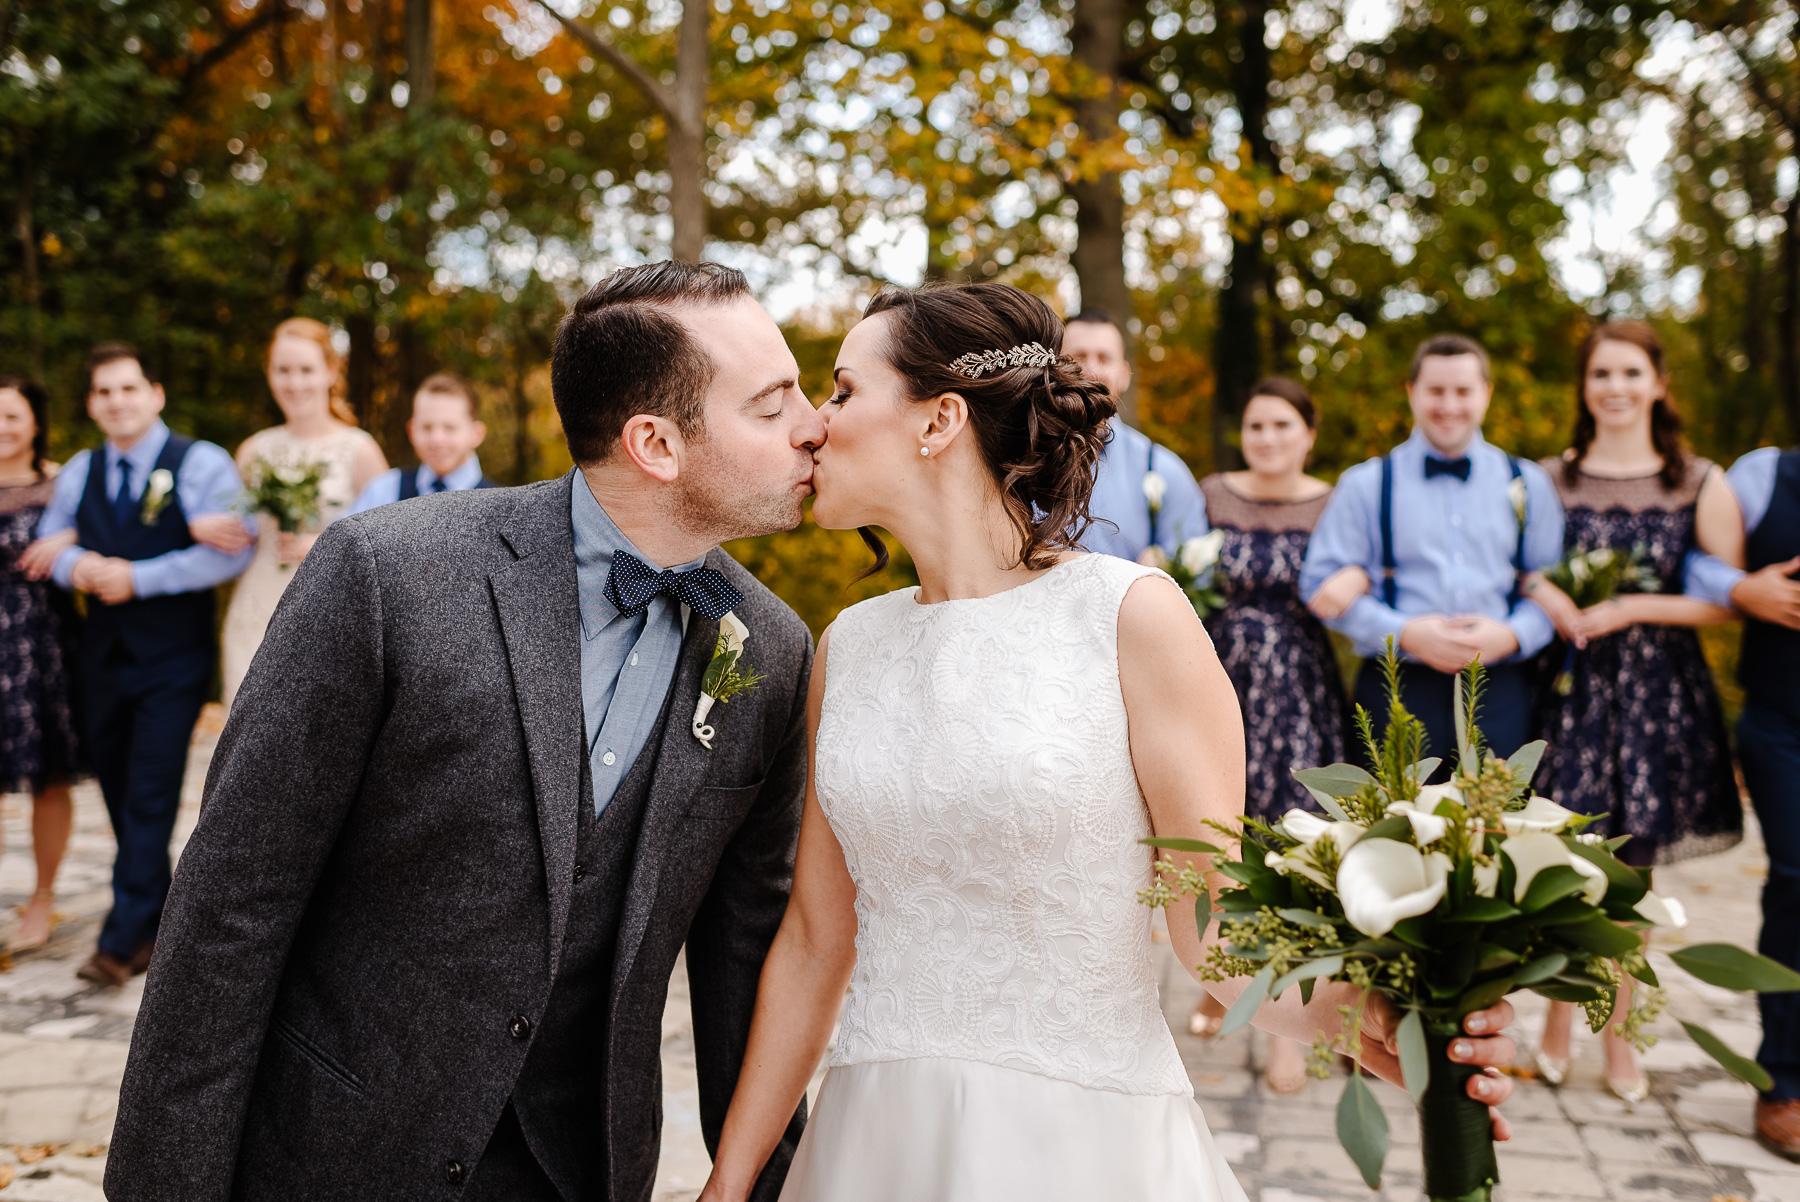 57-Laurita Winery Wedding New Jersey Wedding Photographer Laurita Winery Weddings Longbrook Photography.jpg